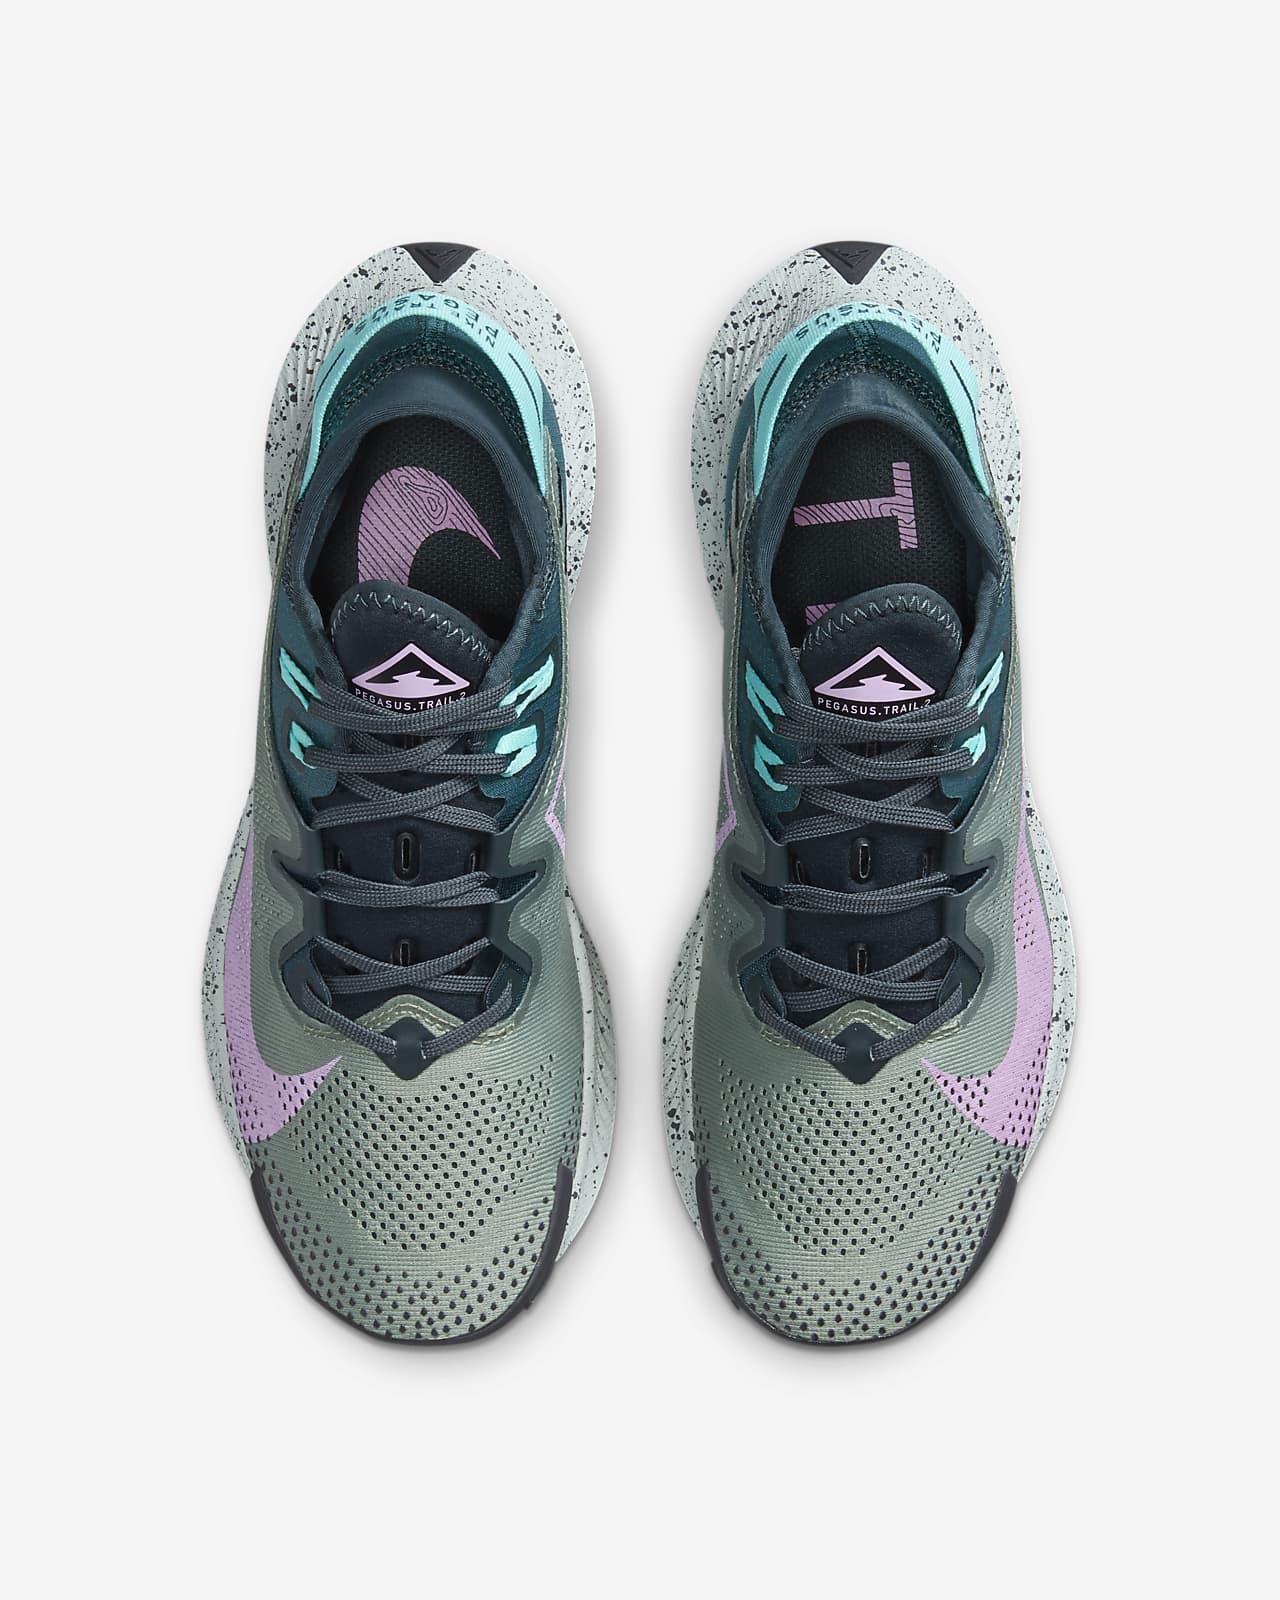 cuenca Descanso Premio  Nike Pegasus Trail 2 Damen Trail Running-Schuh. Nike DE